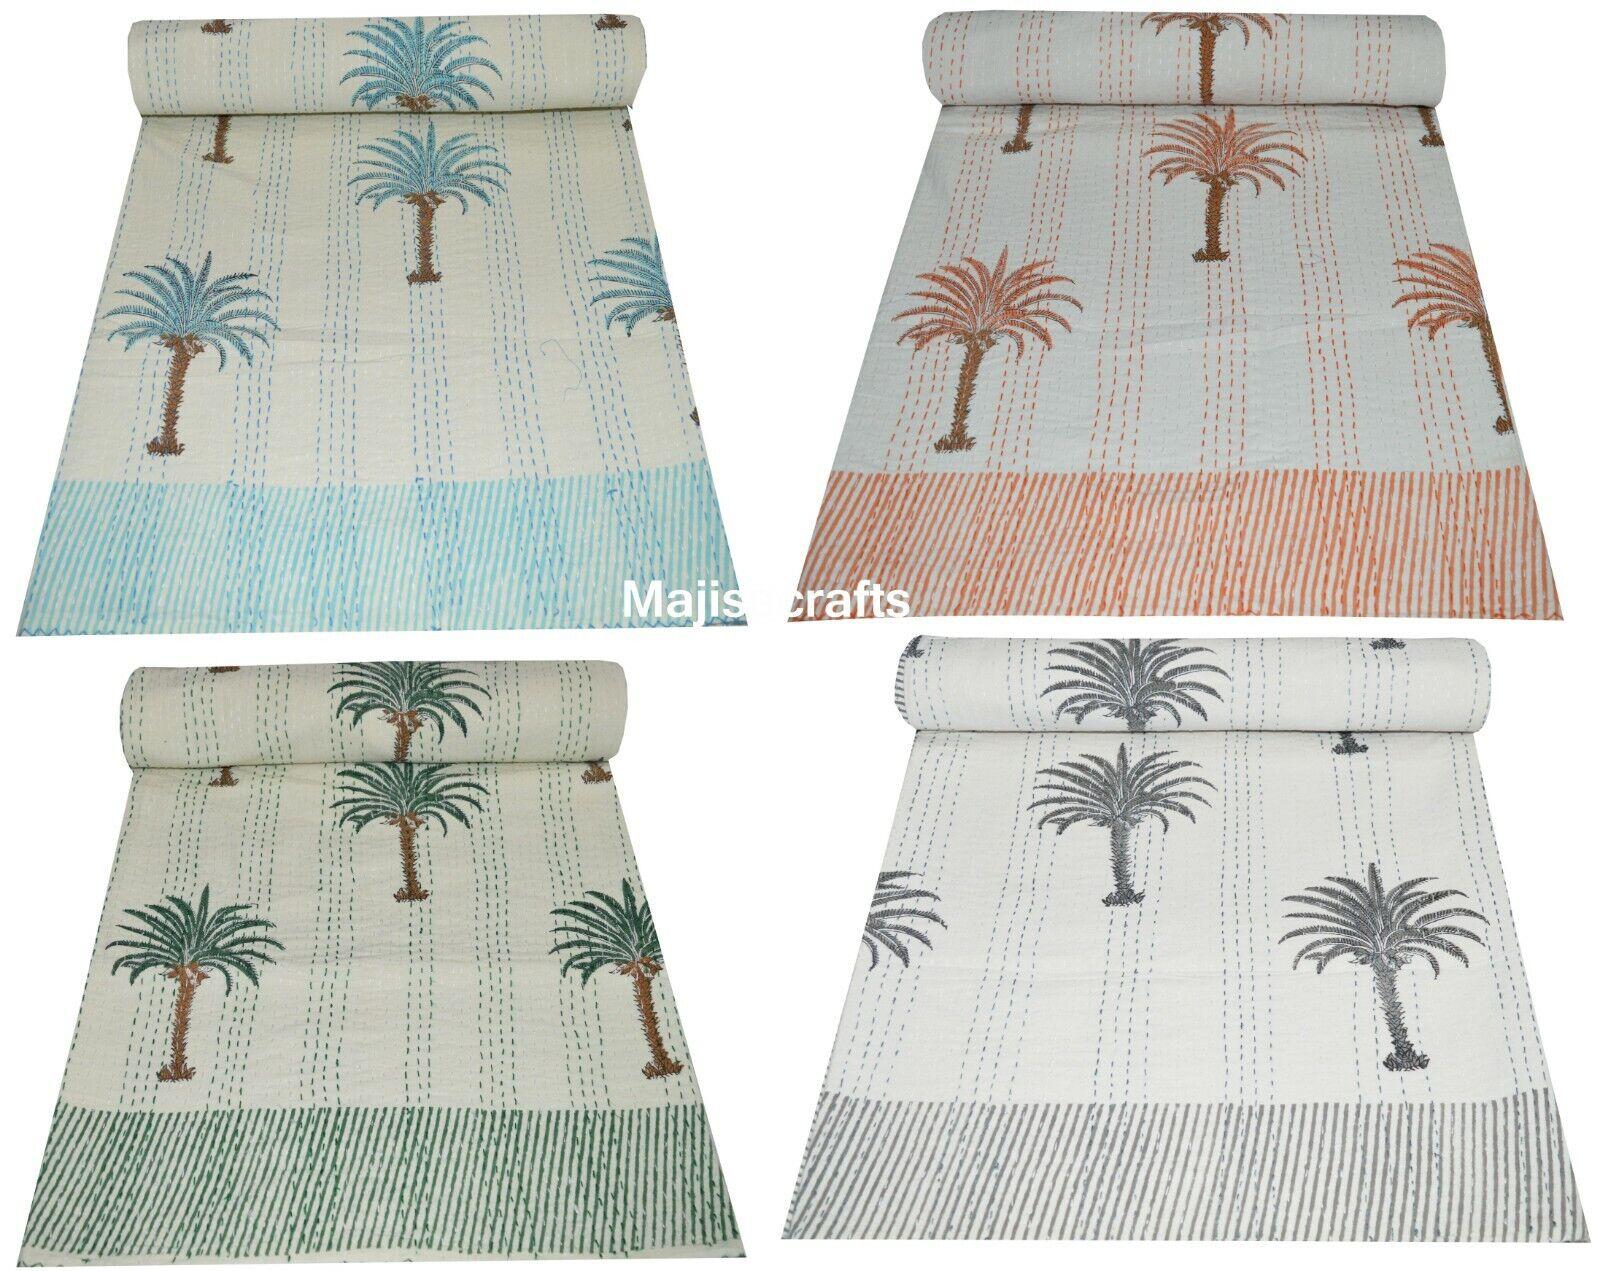 Kantha Quilt Bettspread Blanket Bettding Throw Handmade Palm Tree Königin Indian Kunst